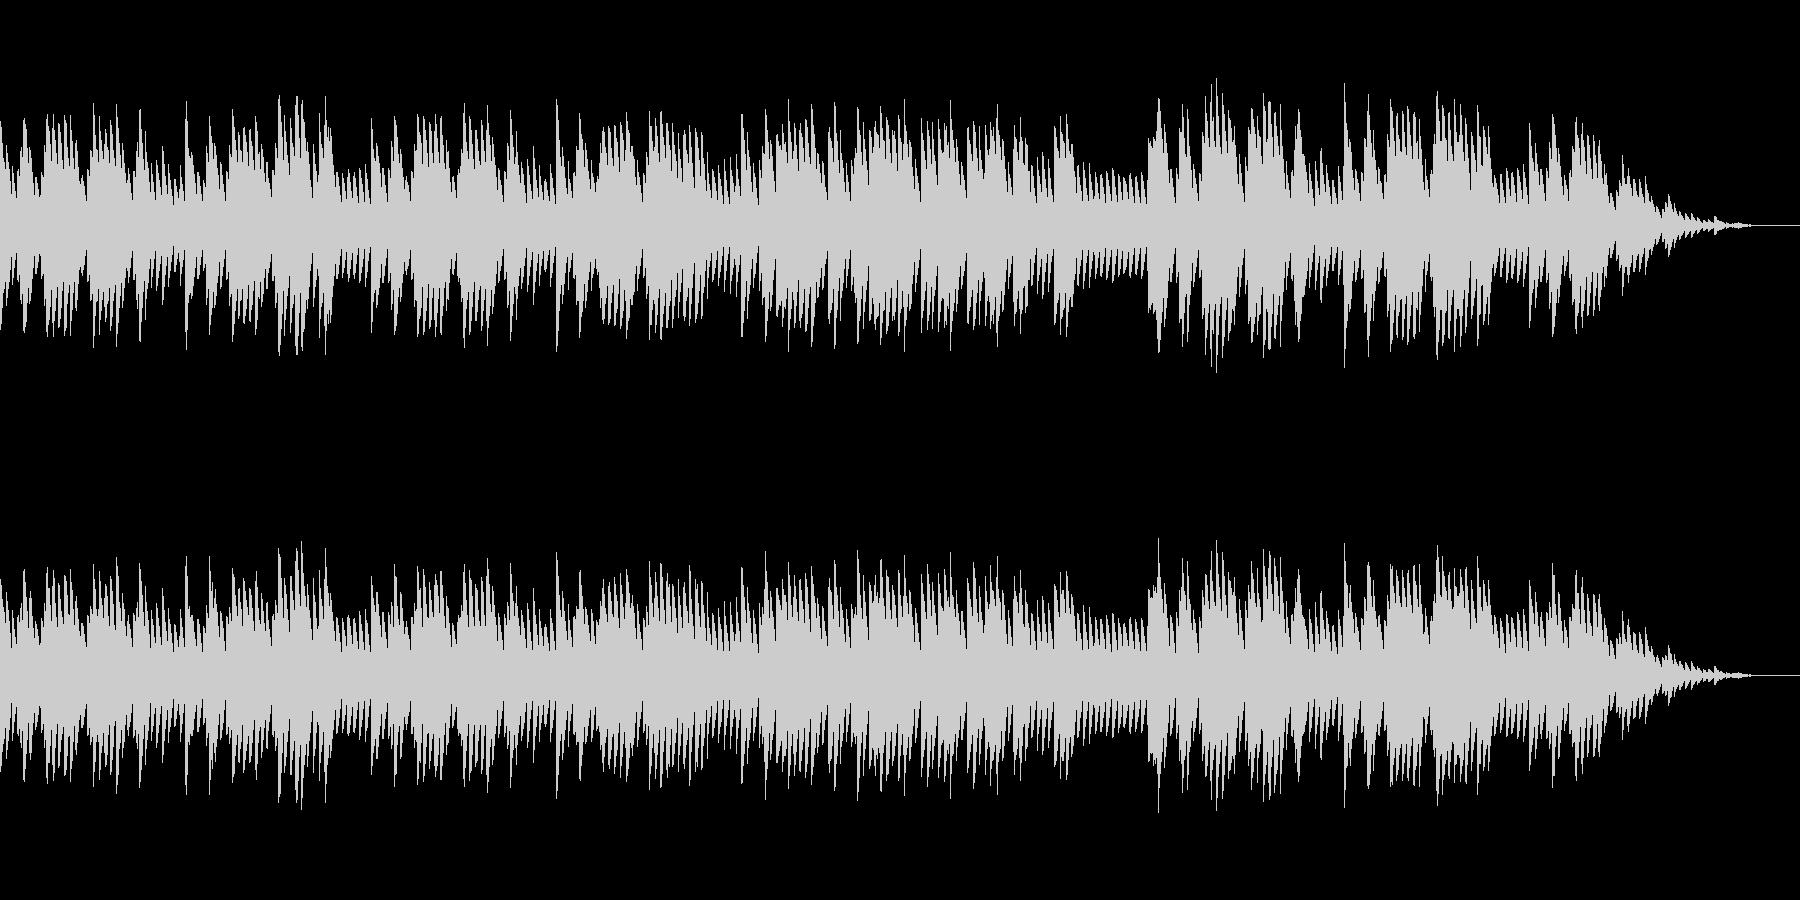 8bitクラシック-パヴァーヌ-の未再生の波形